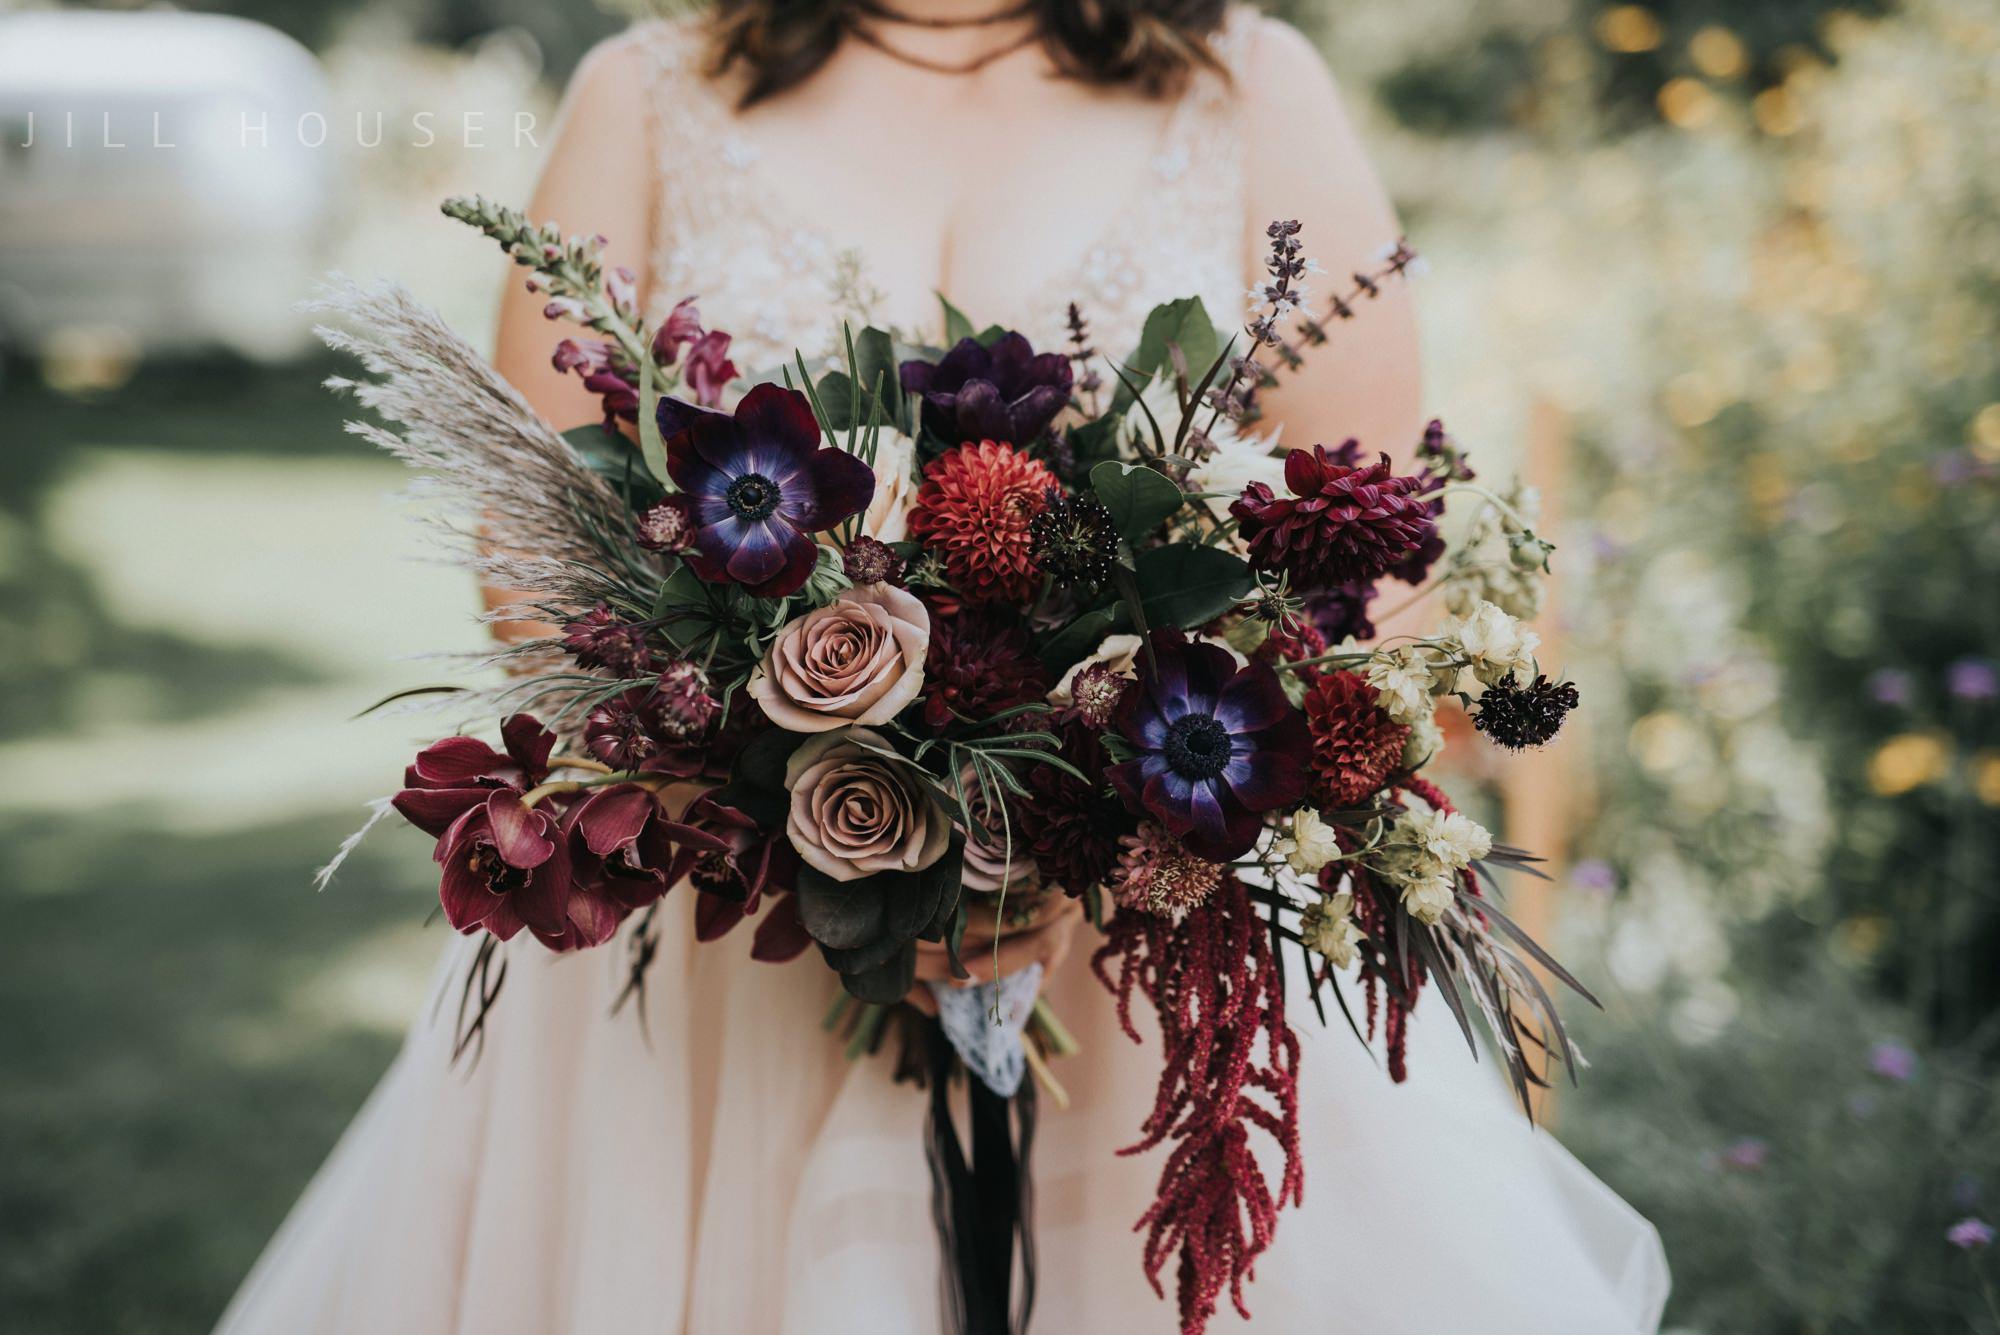 cora-kendall-wedding-sneak-peek-004.JPG